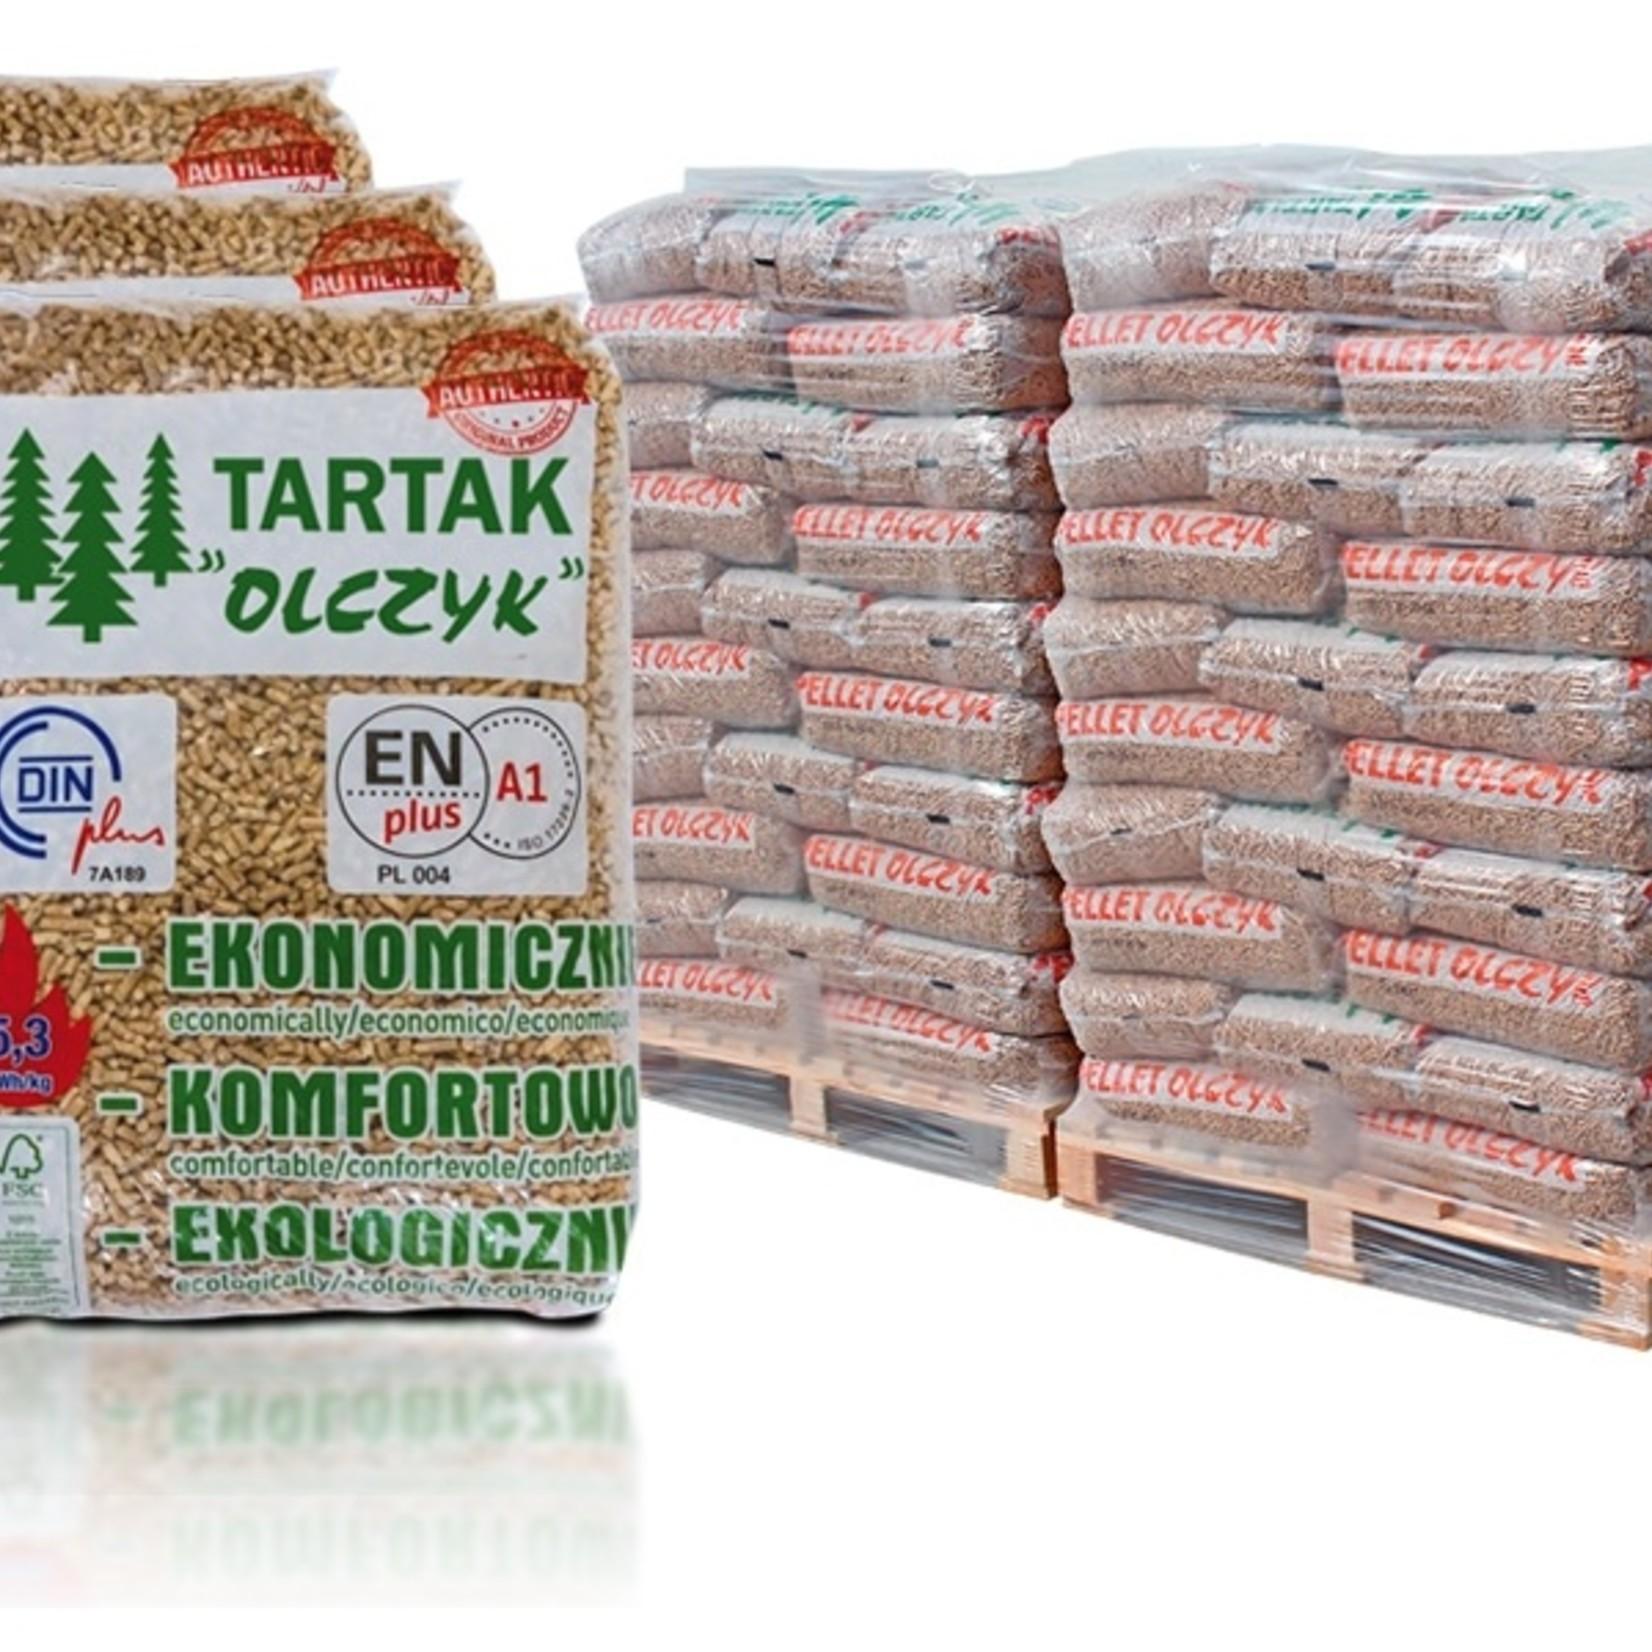 Tartak Tartak 100% naaldhout Pellet EN+ A1 per zak 15 kg x 5 = 75 KG.